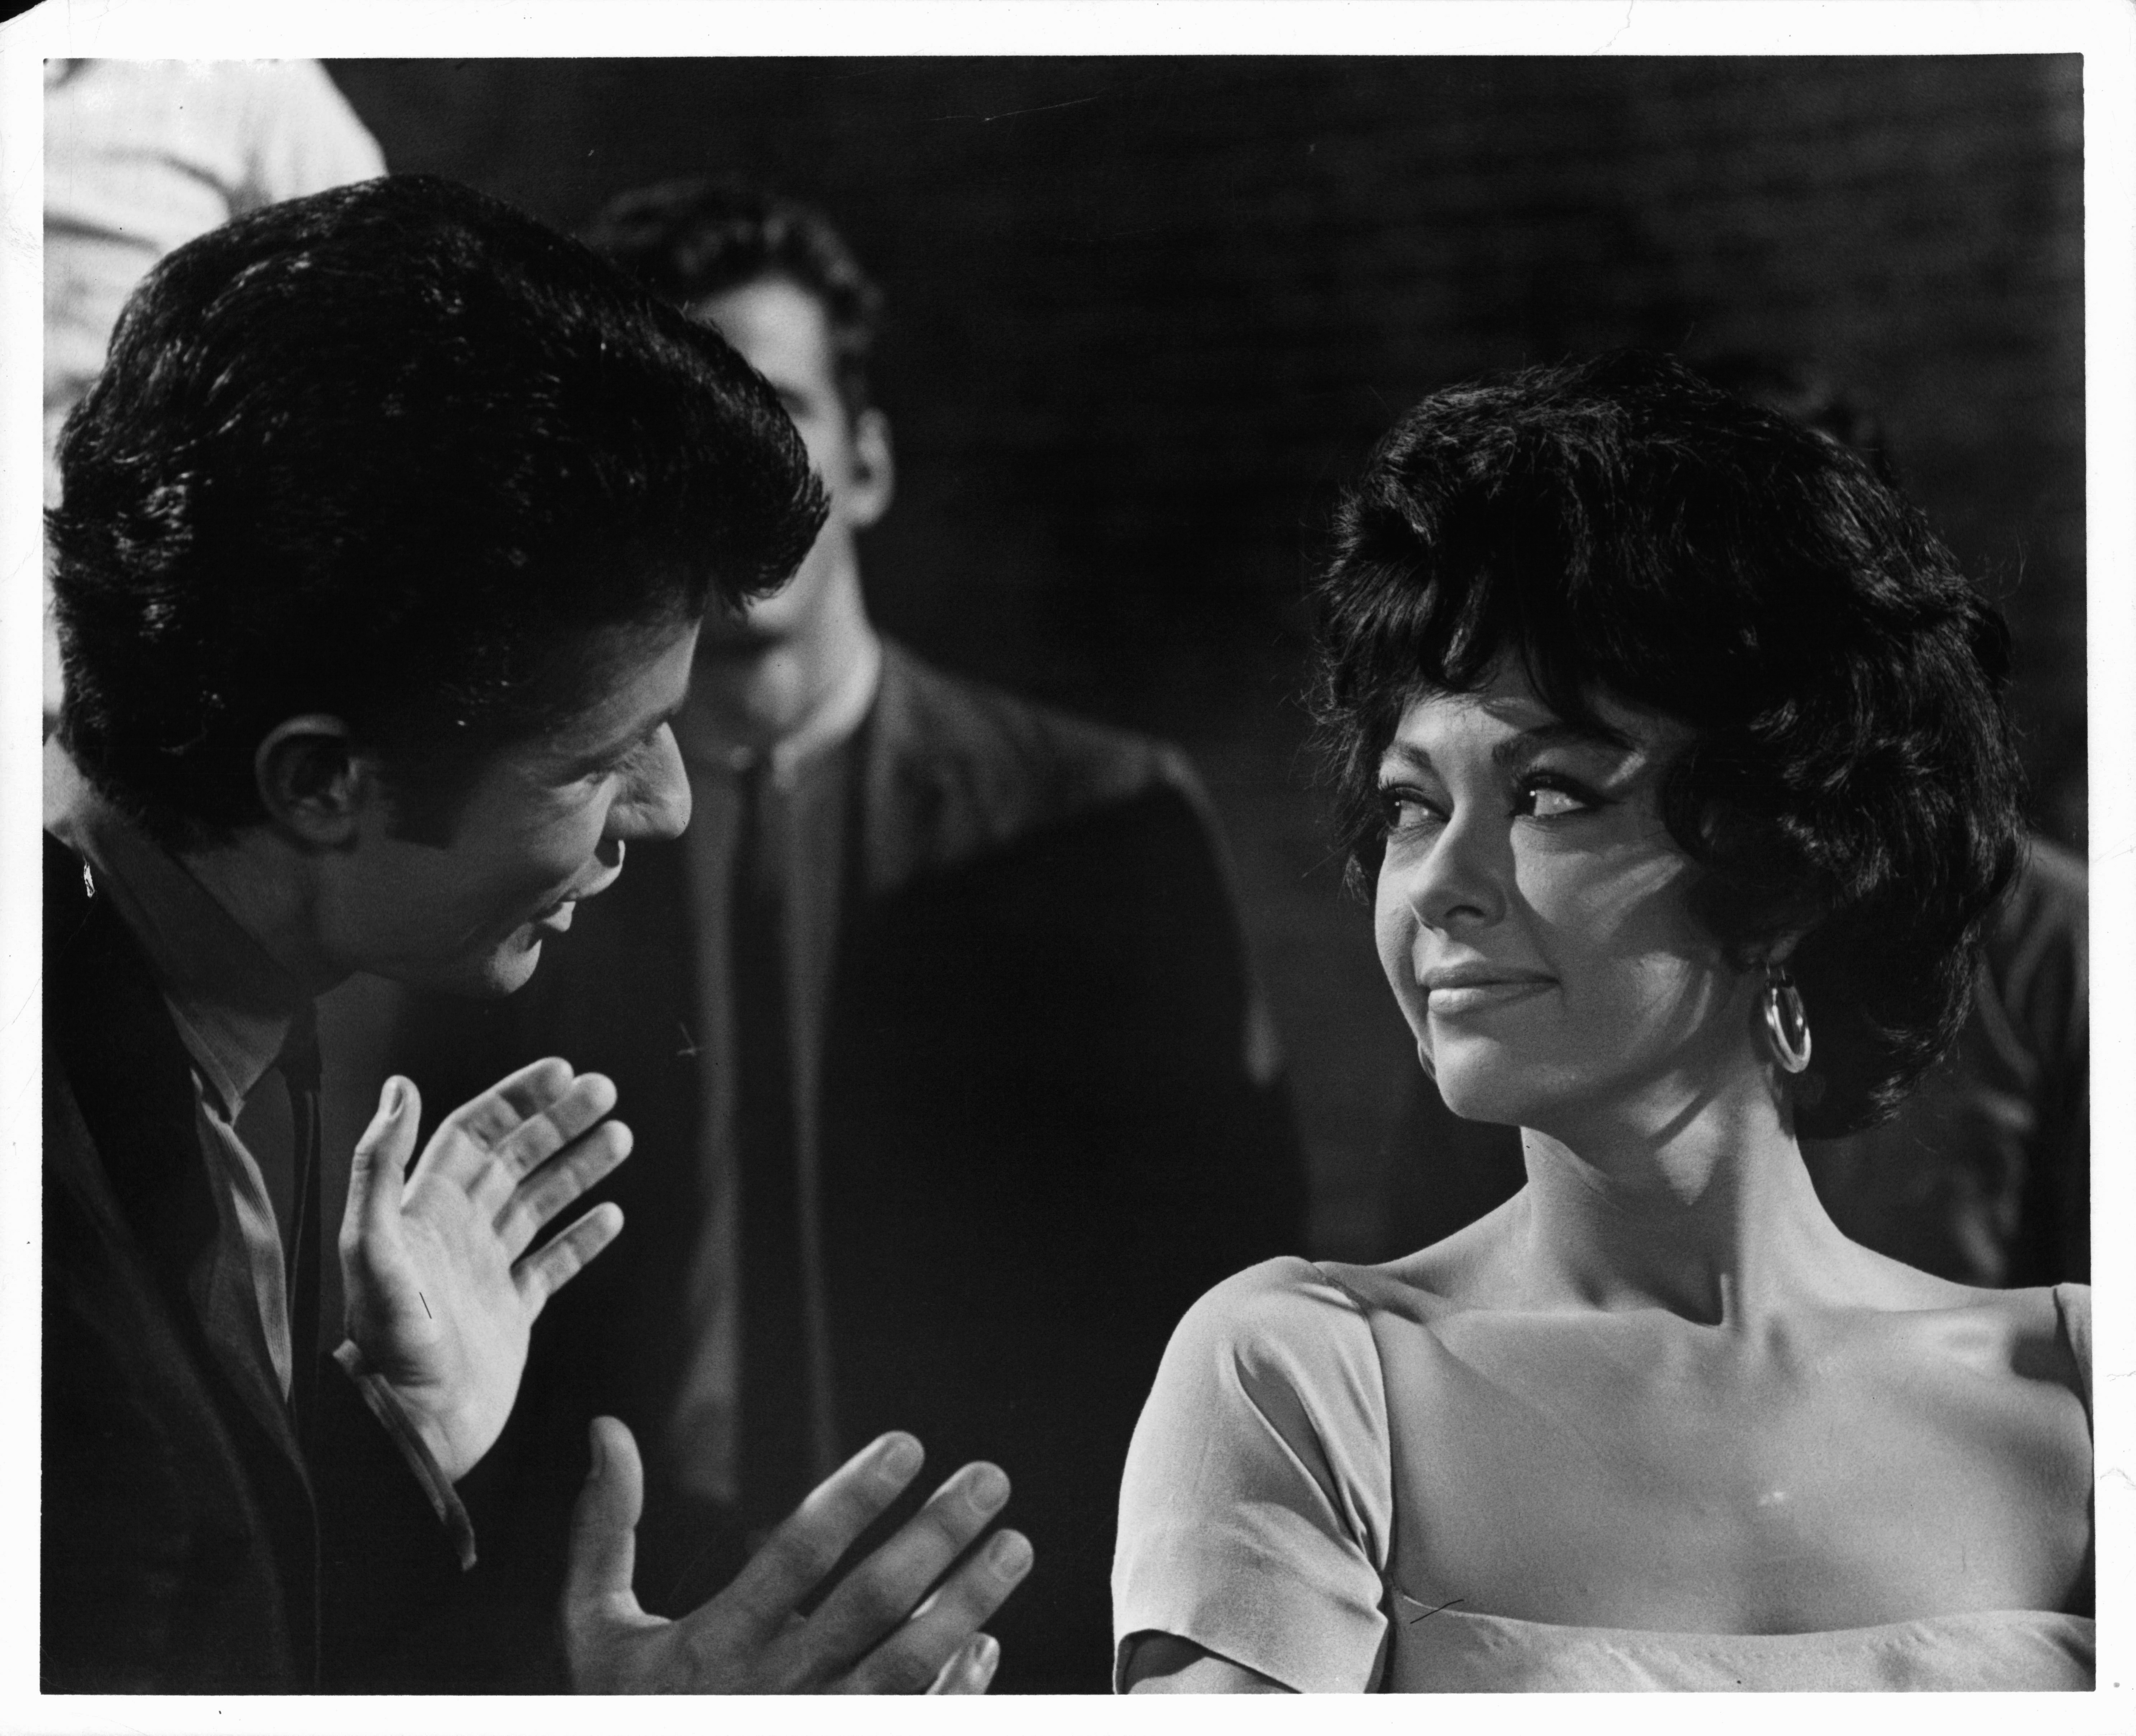 George Chakiris And Rita Moreno In 'West Side Story'